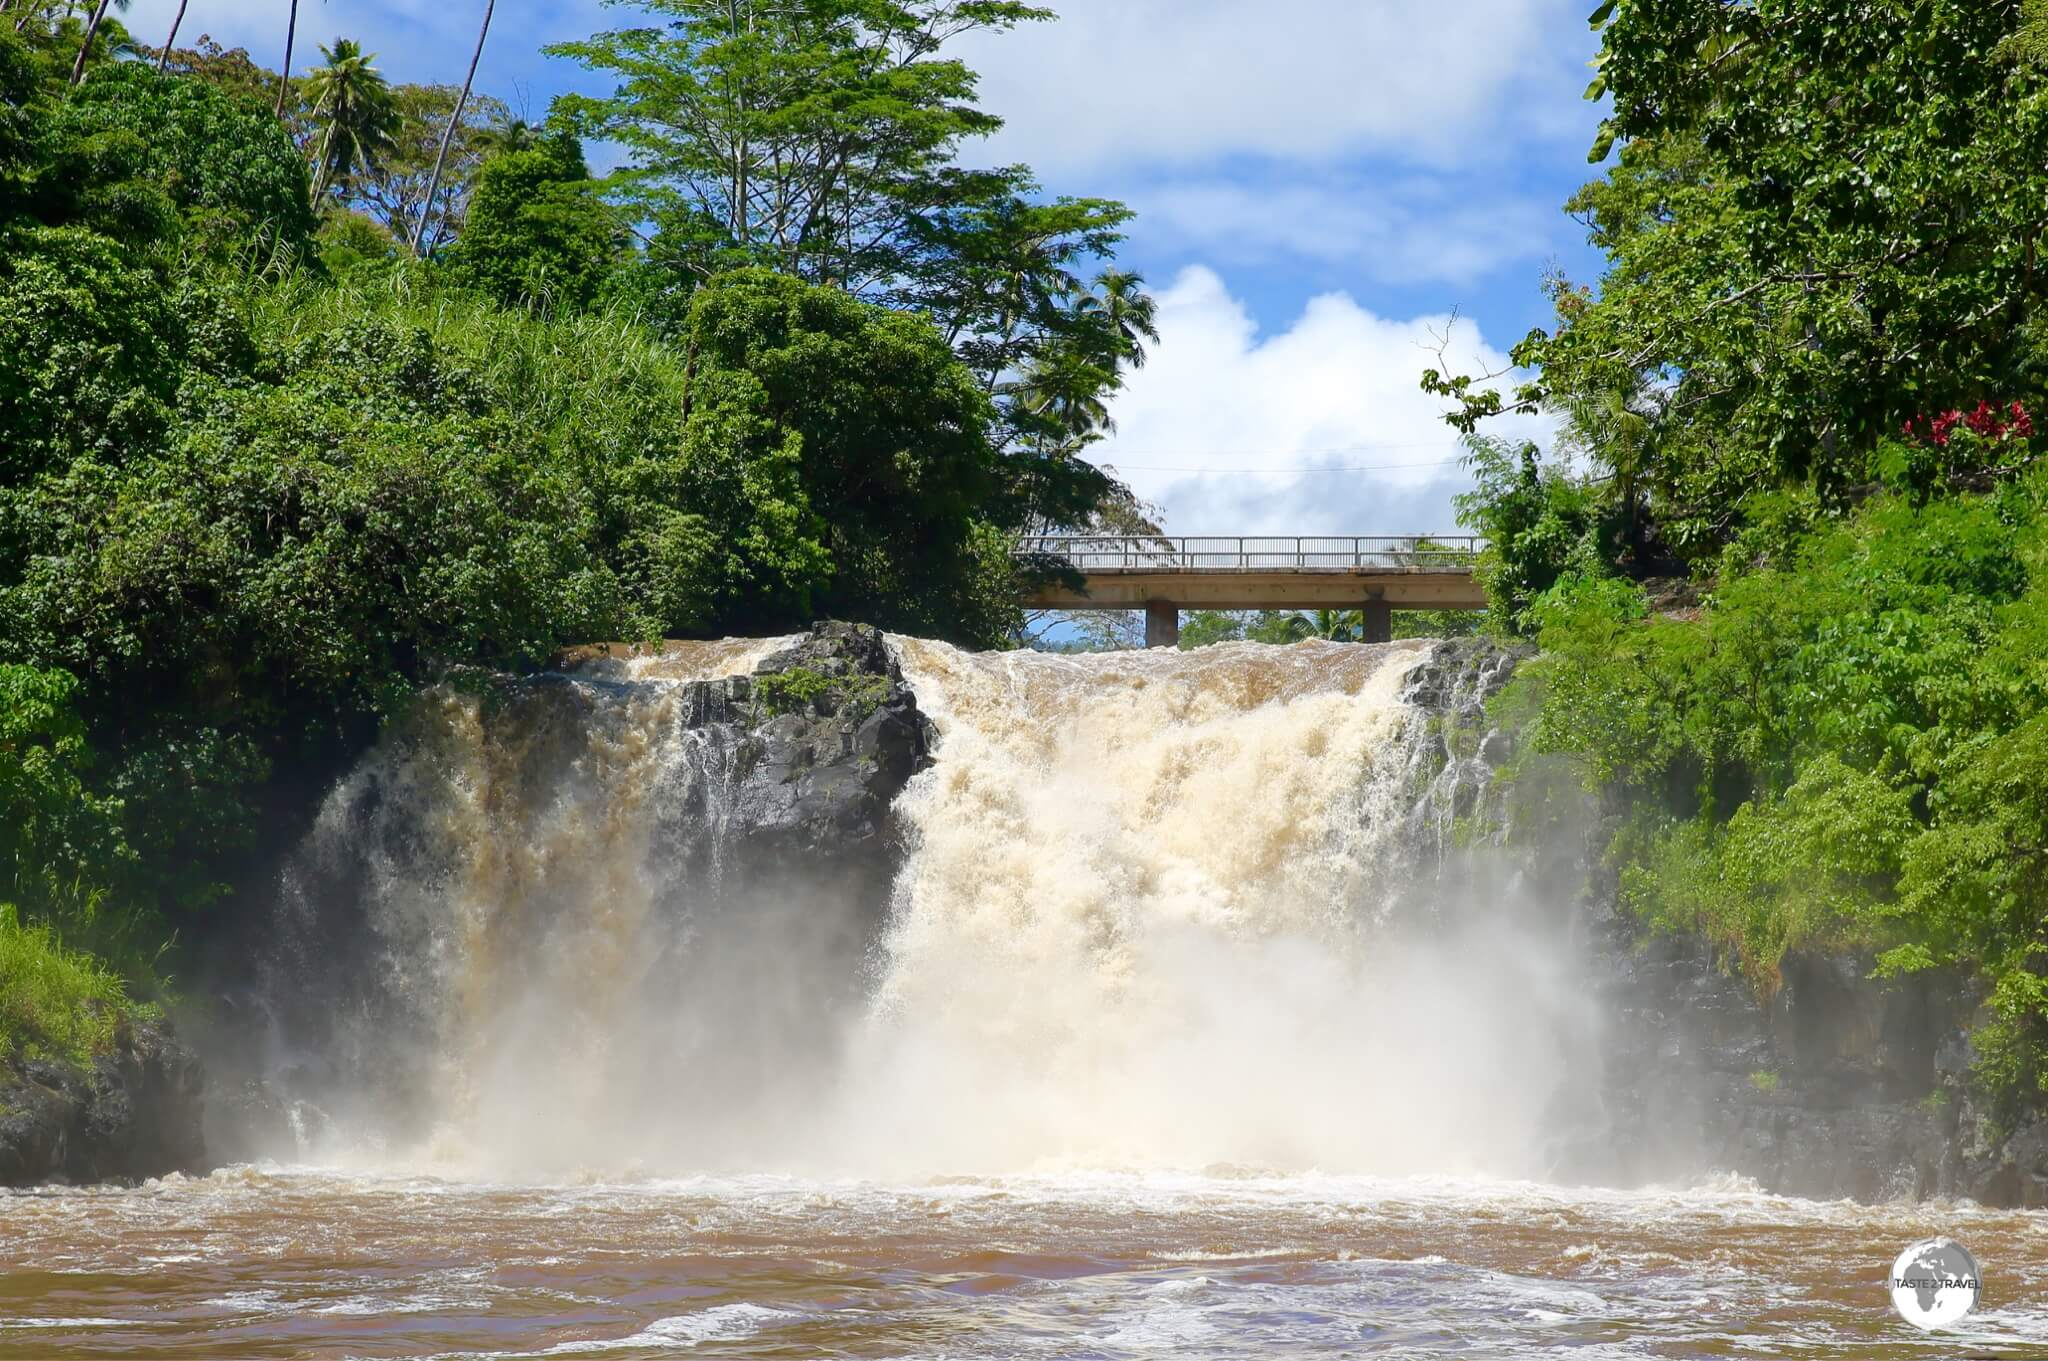 The impressively powerful Falefa Waterfalls.